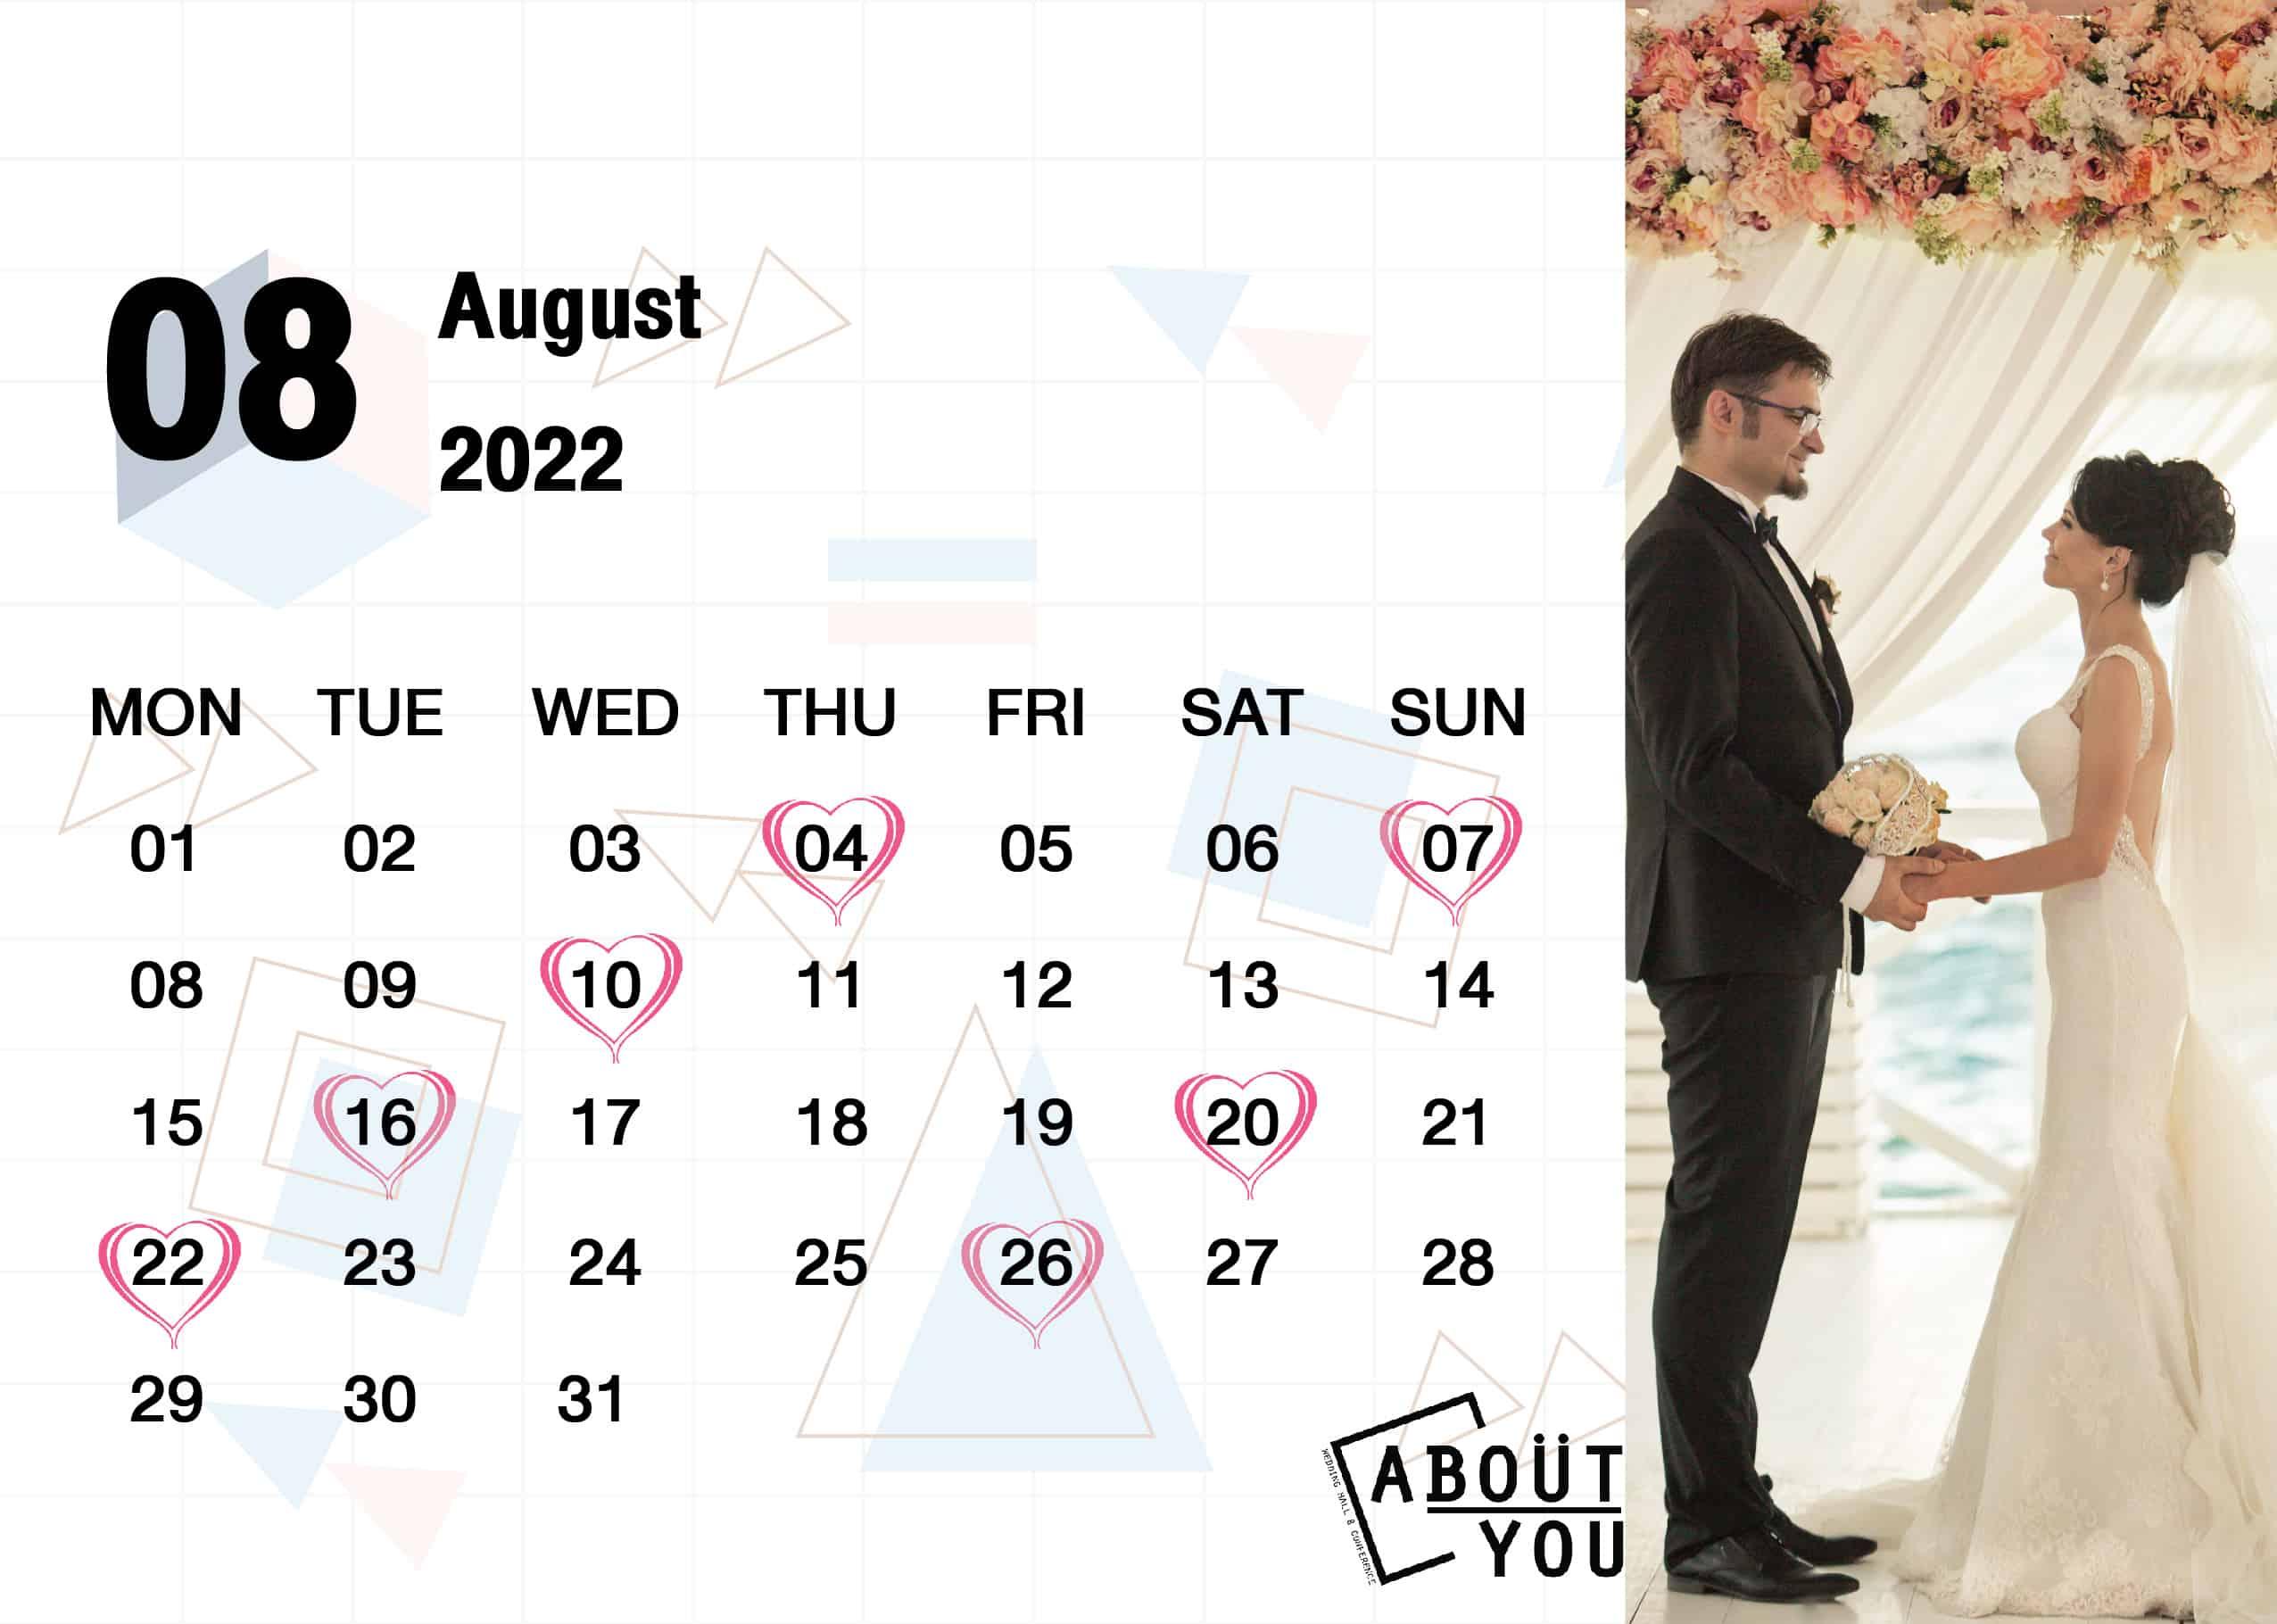 calendar About you-09